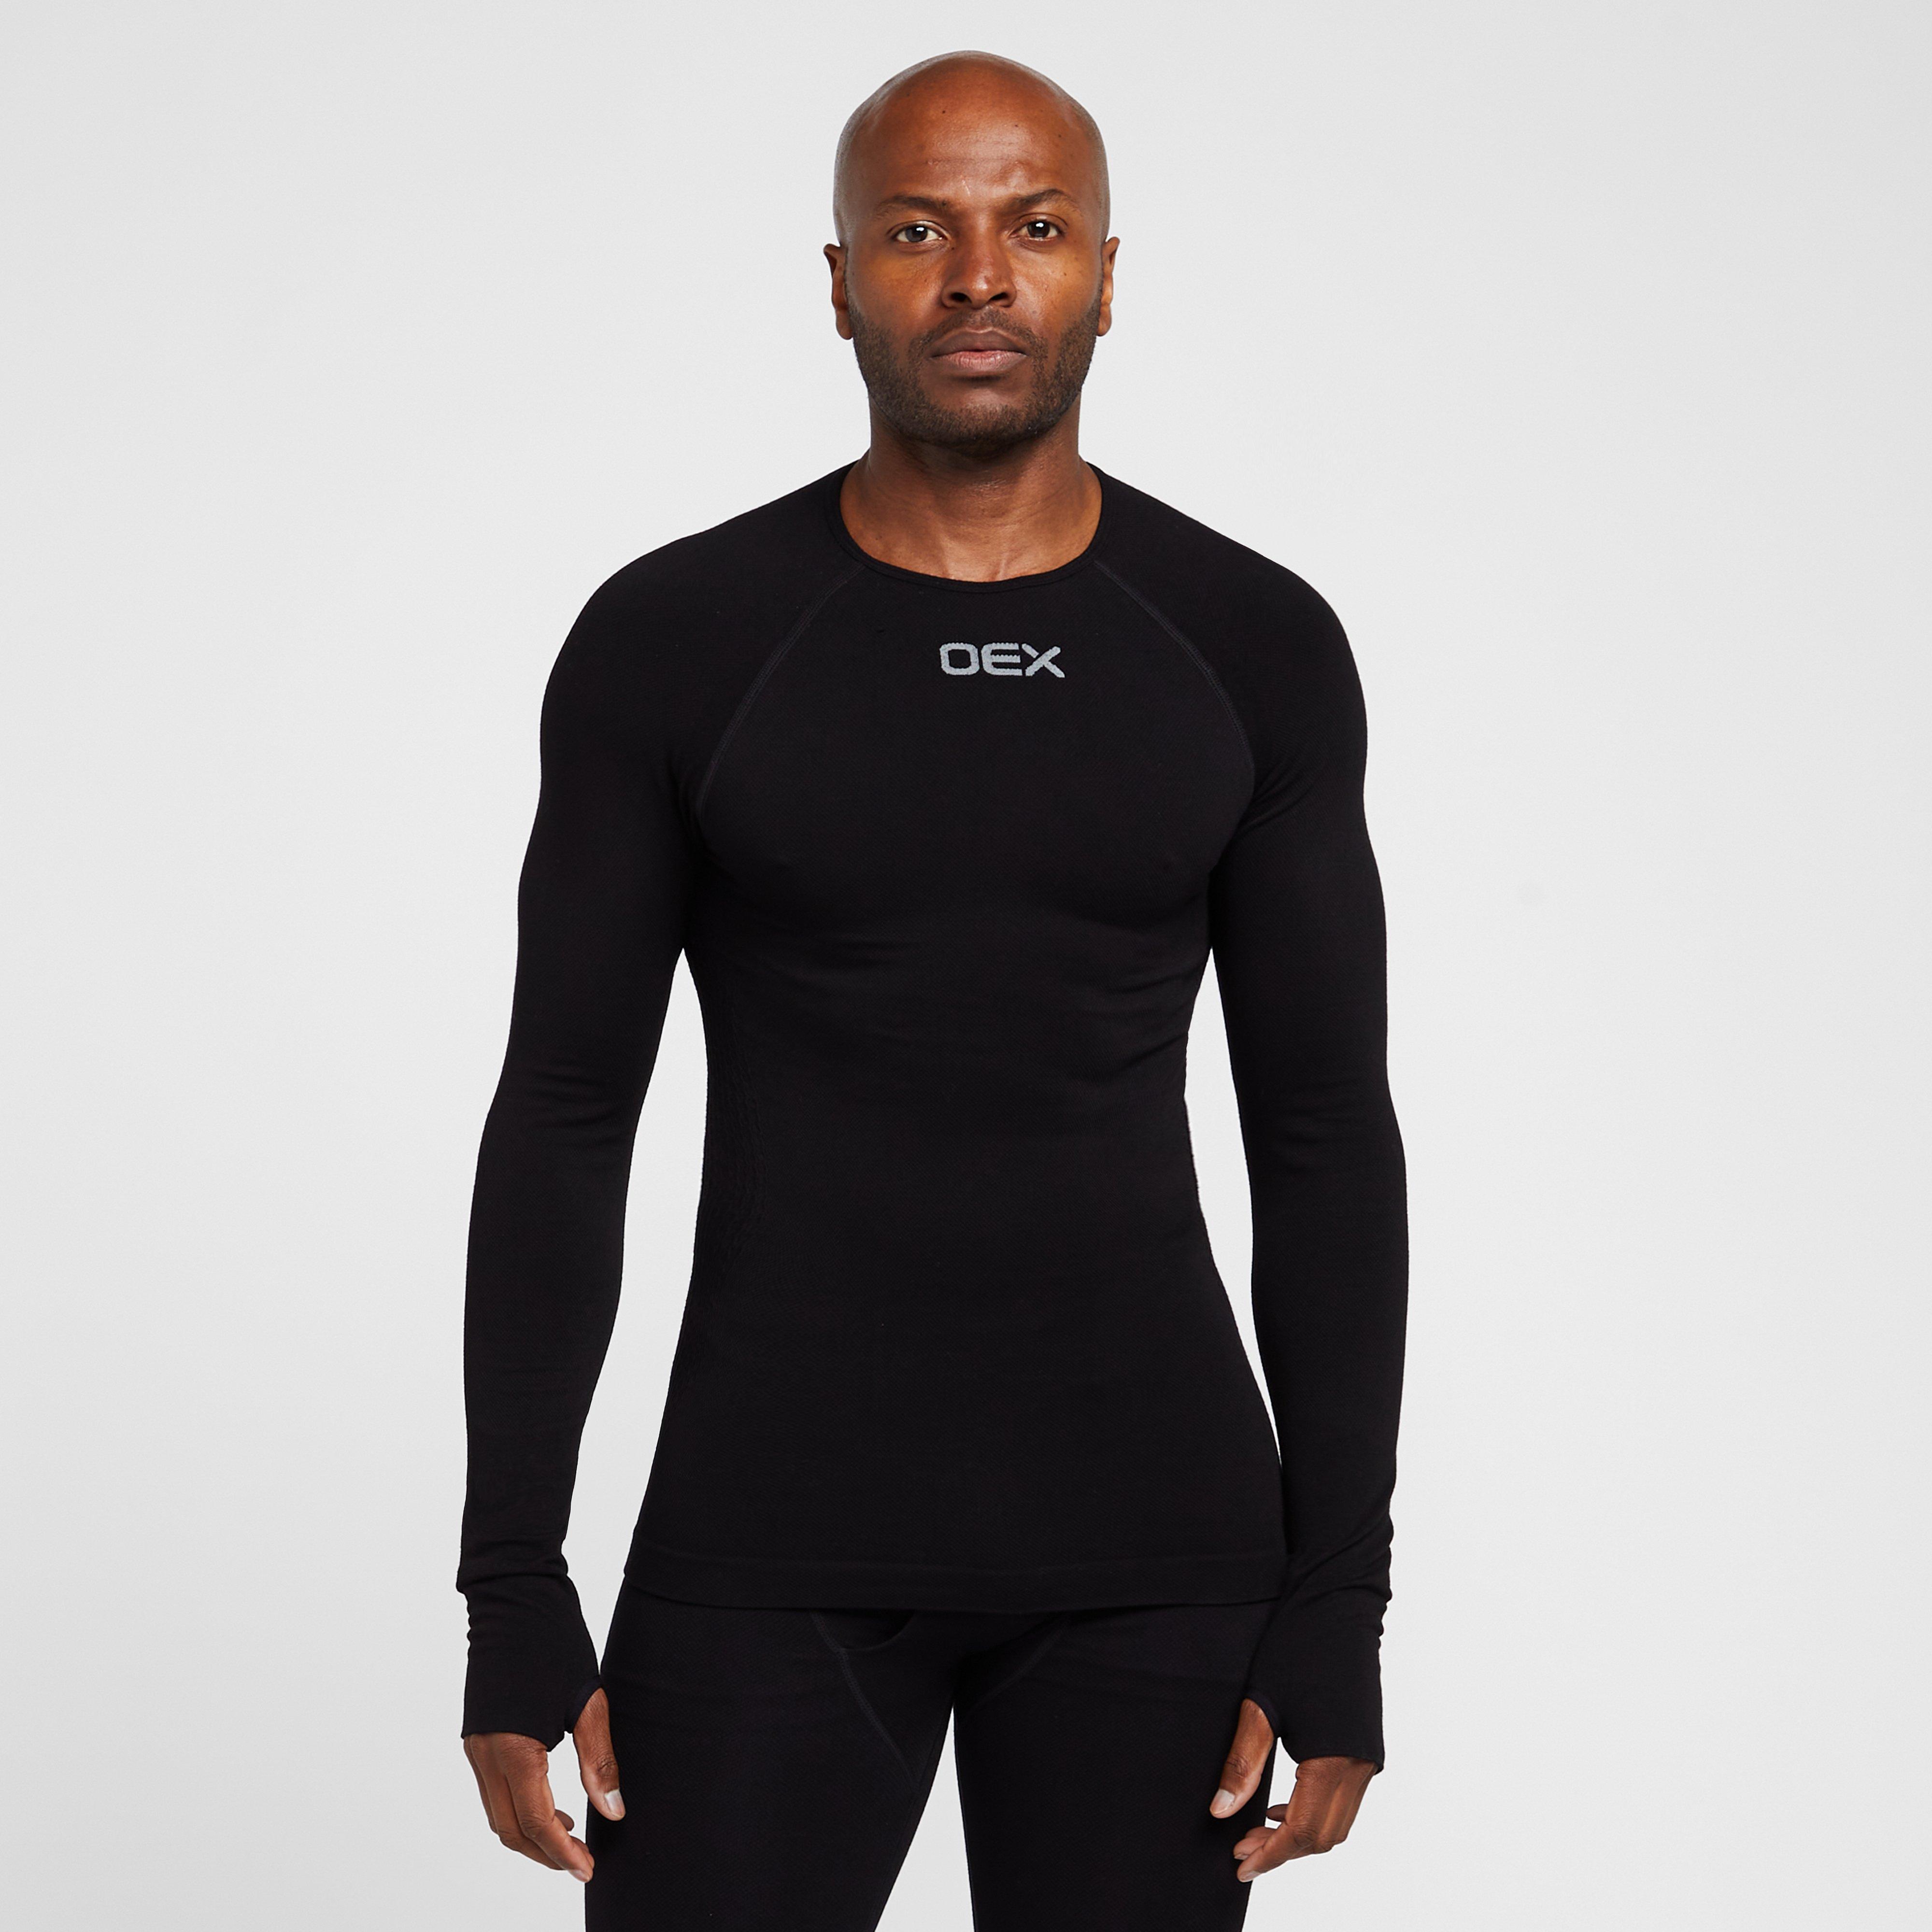 Oex Oex Mens Barneo Long Sleeve Baselayer Top, Black